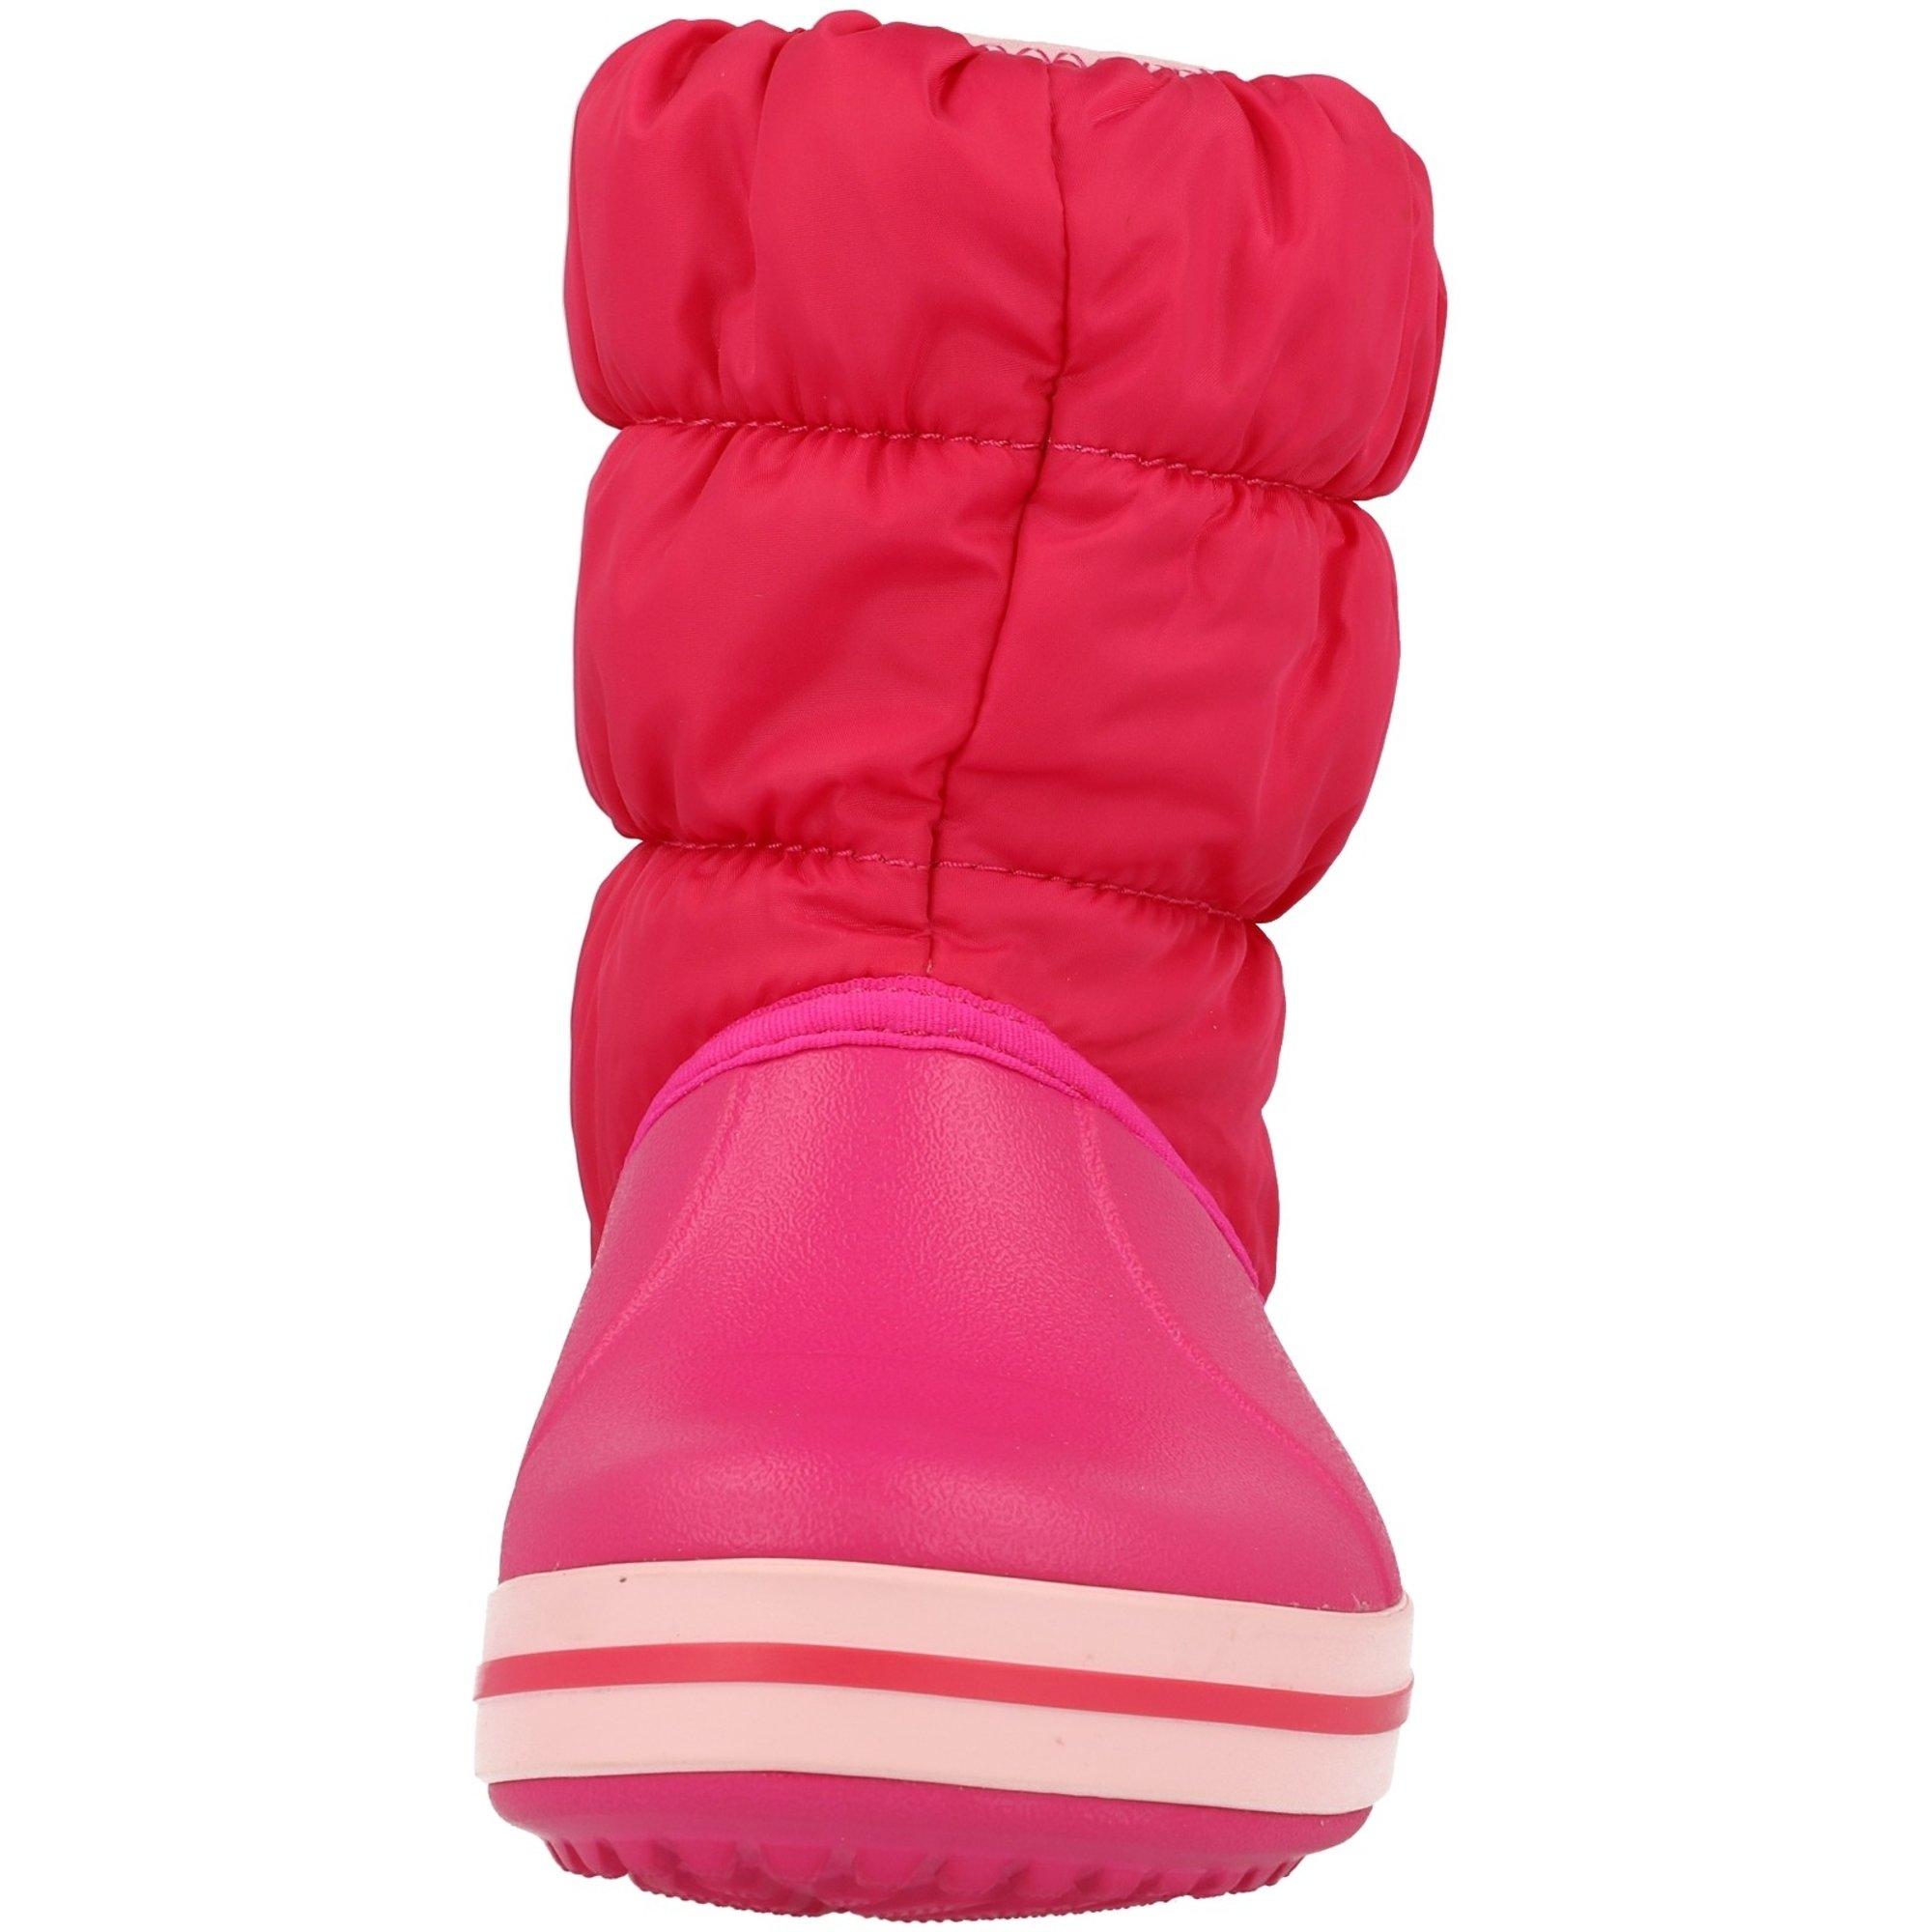 Crocs Kids Winter Puff Boot Candy Pink Nylon Infant